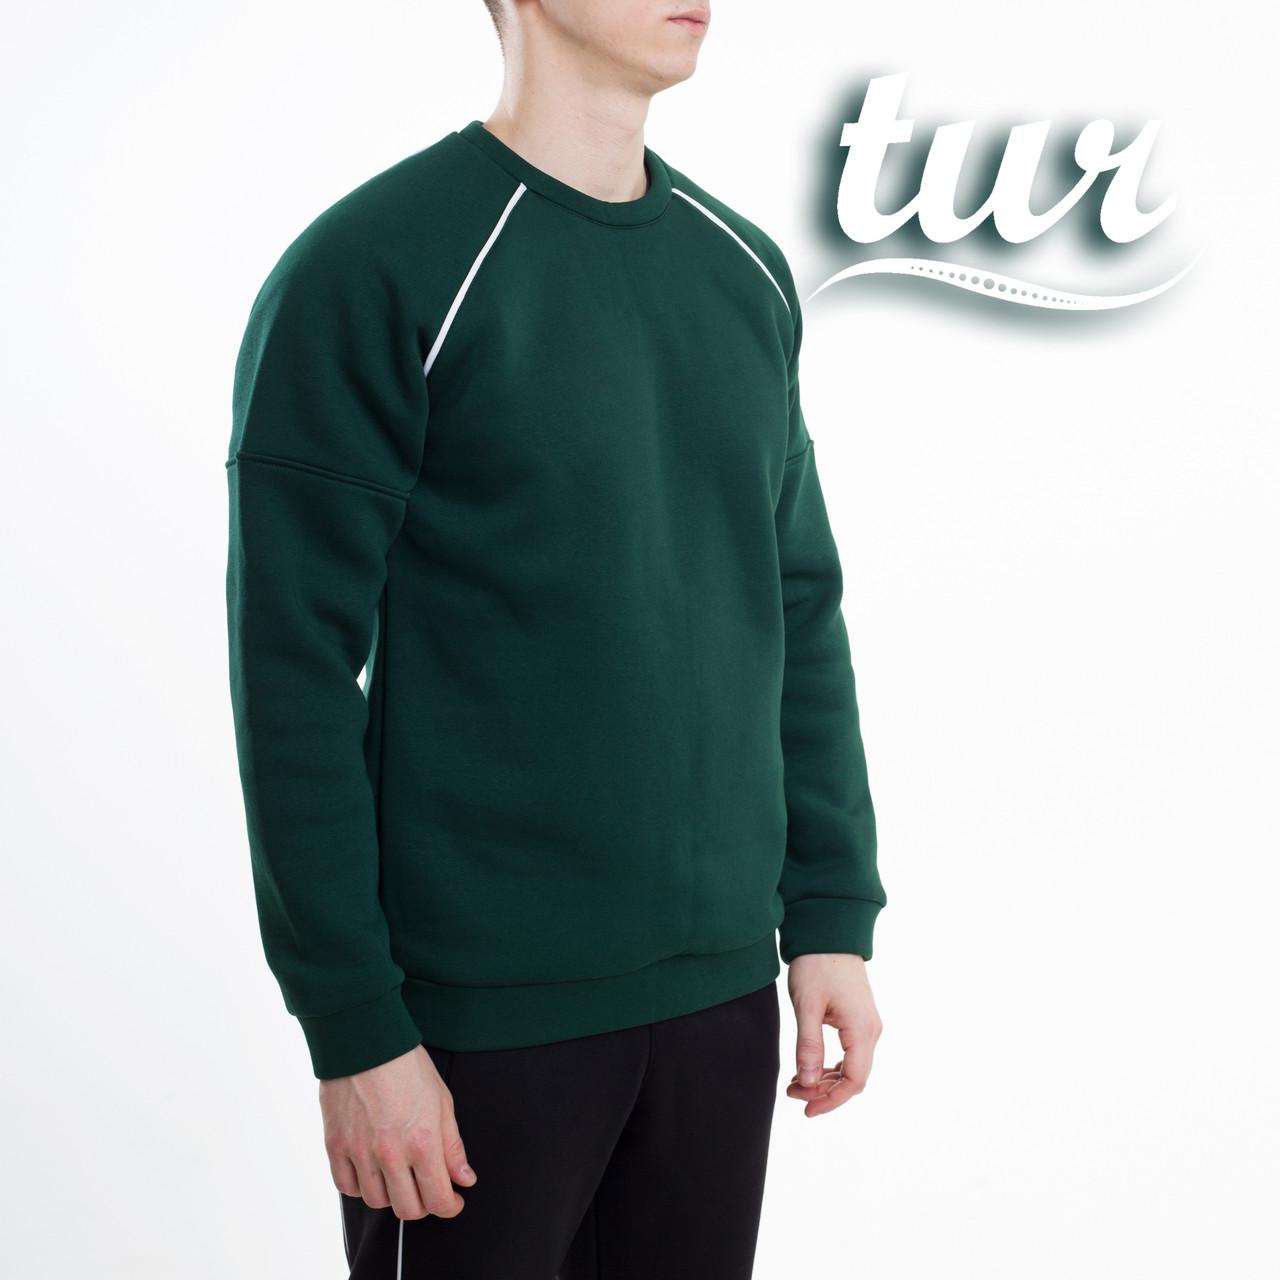 Зимний свитшот реглан мужской зеленый от бренда ТУР Сектор (Sector) размер S, M, L, XL